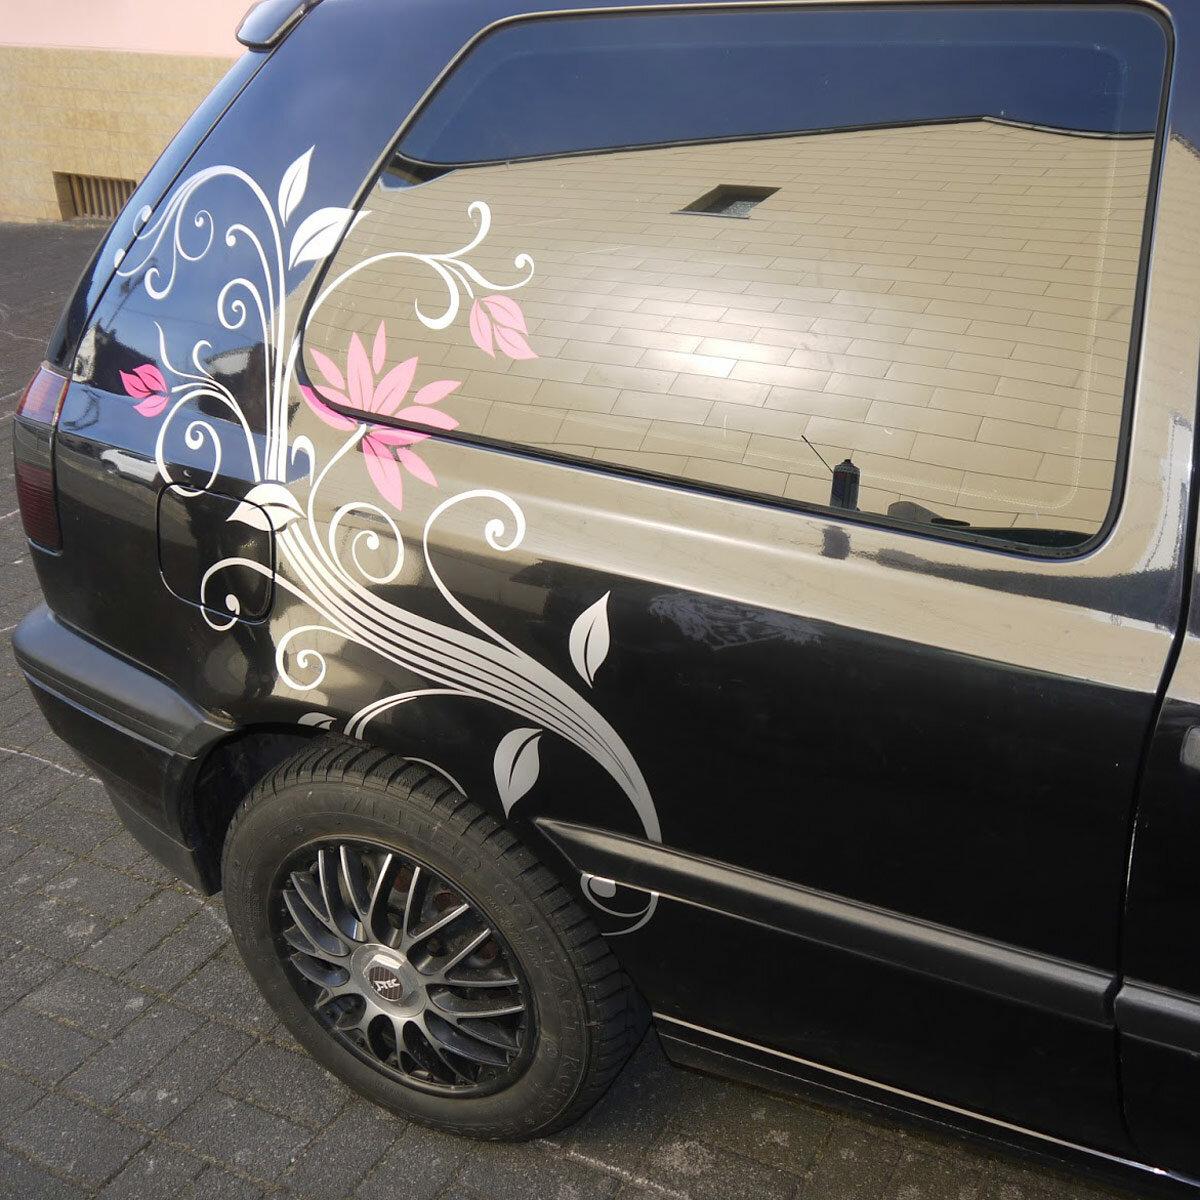 blumenranke autoaufkleber blumen aufkleber ranken auto. Black Bedroom Furniture Sets. Home Design Ideas